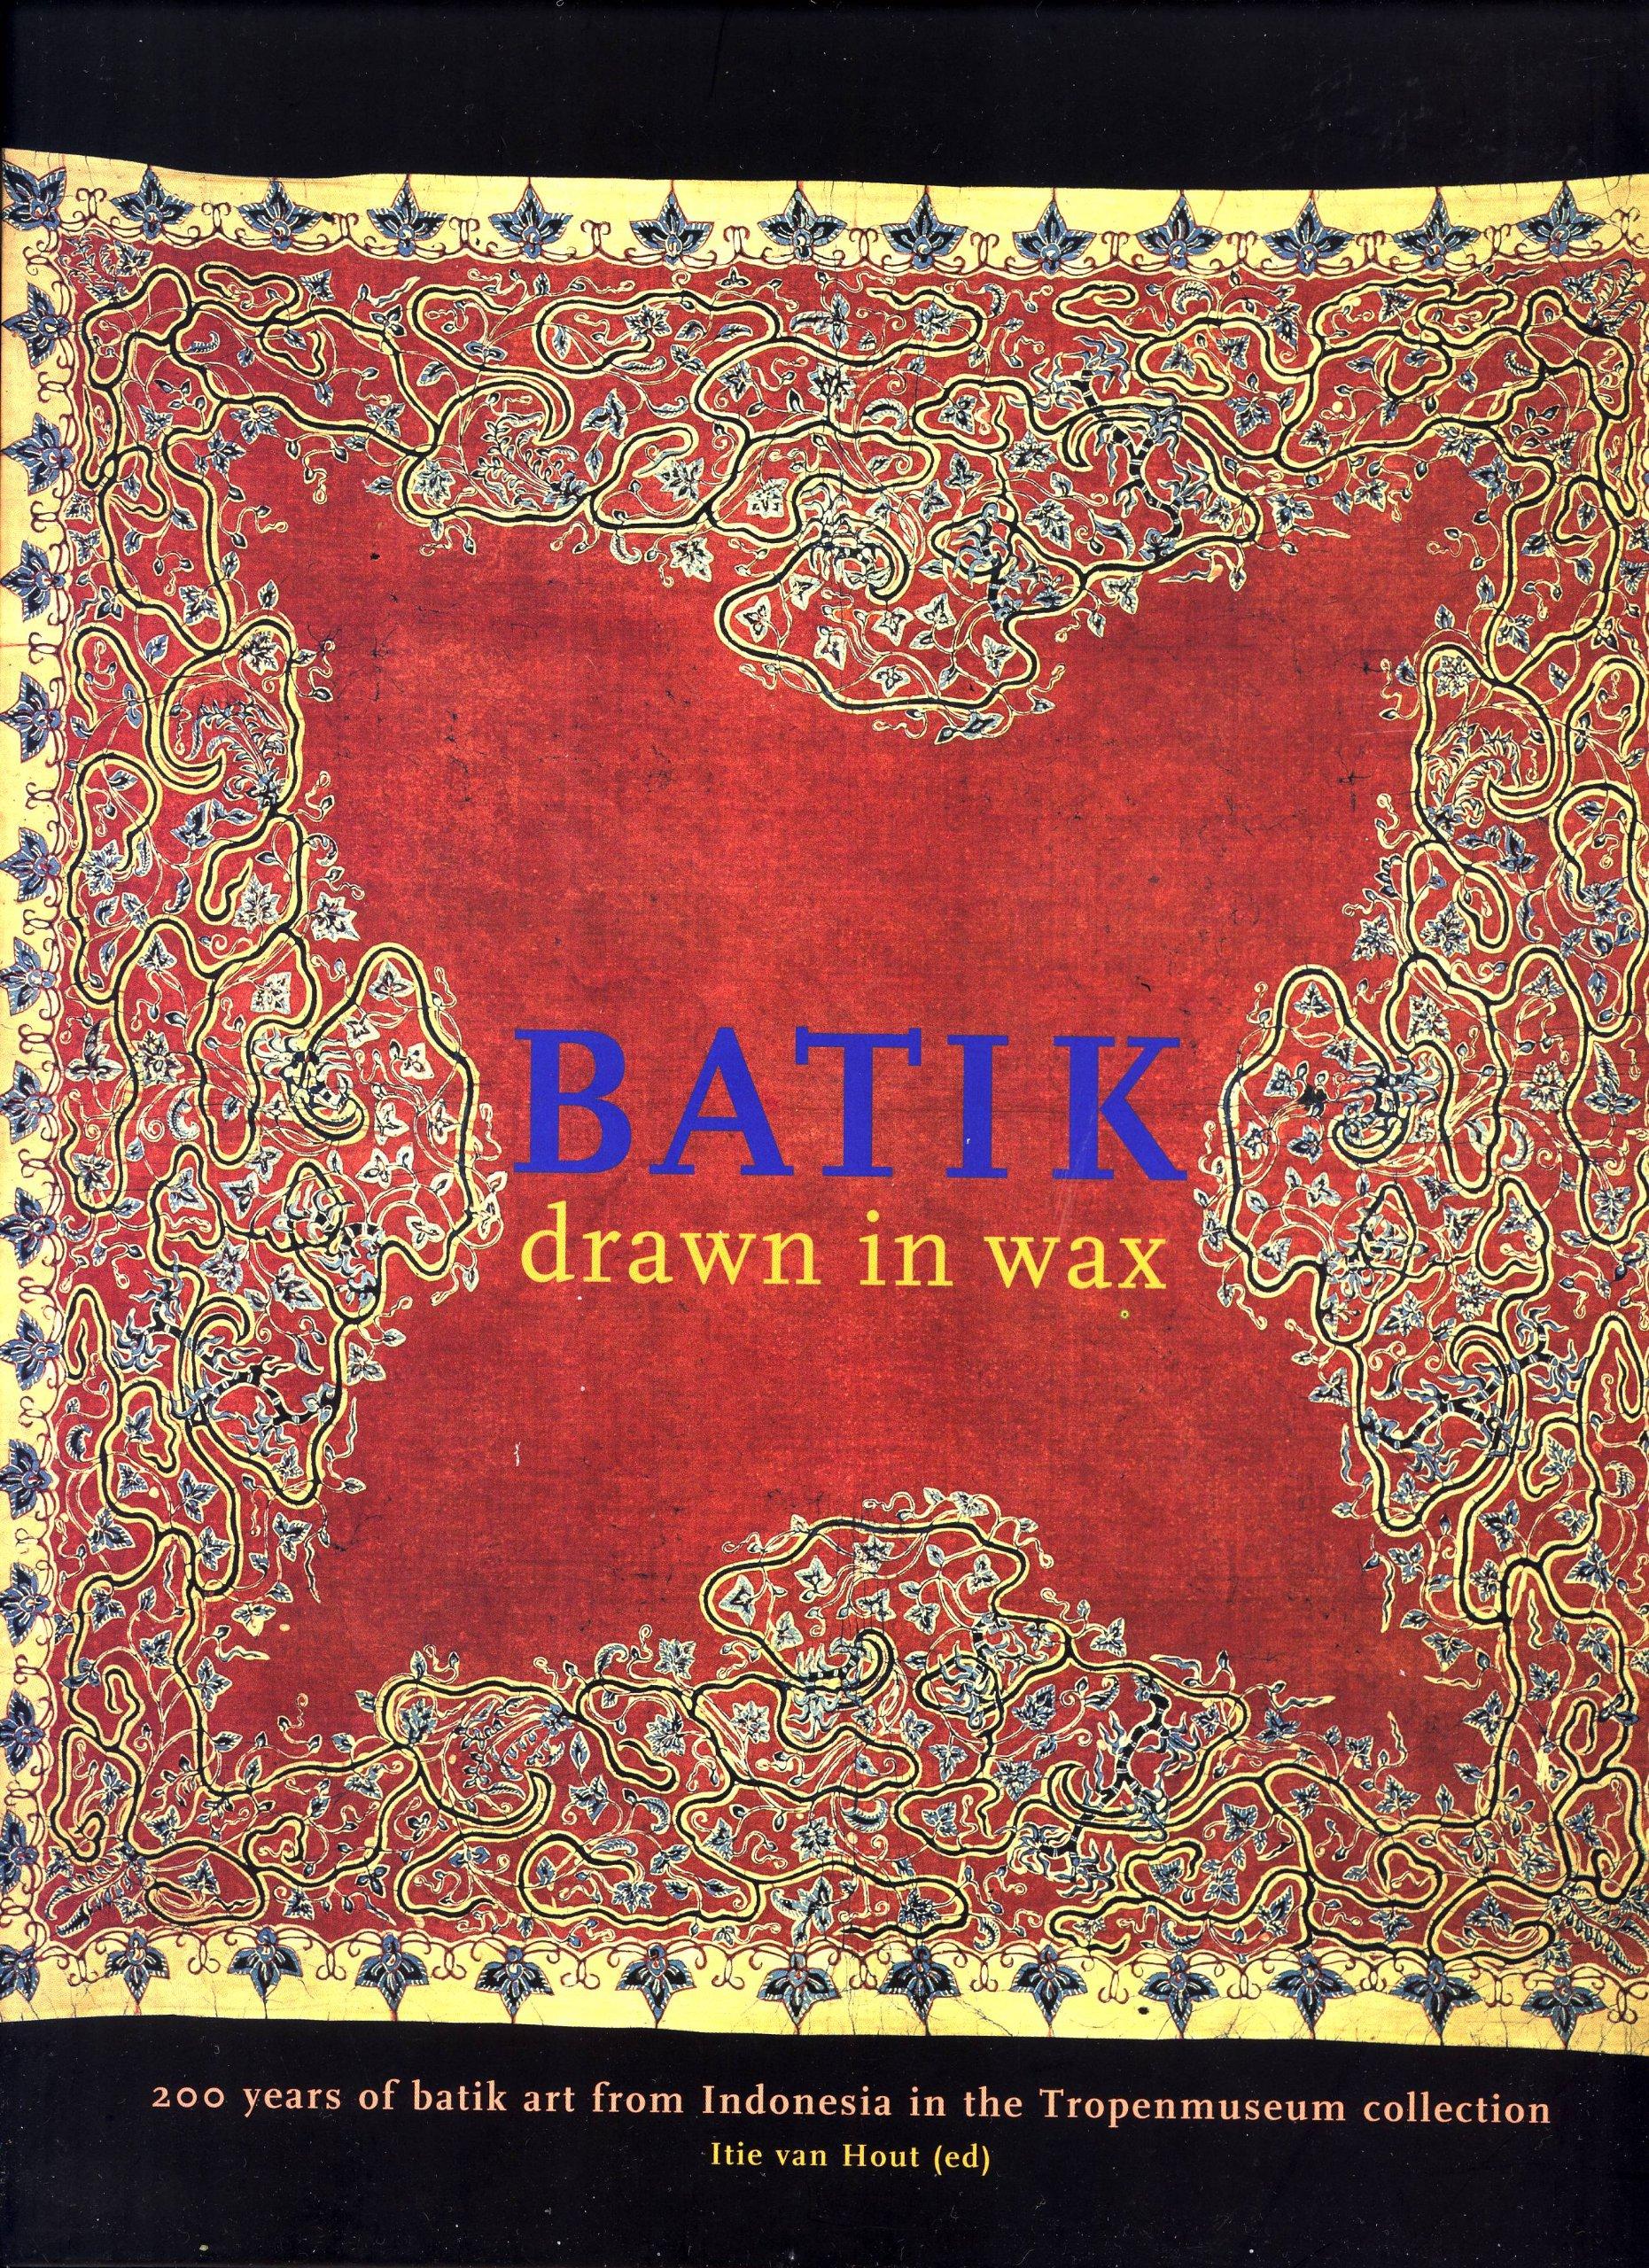 batik drawn in wax 200 years of batik art from indonesia in the